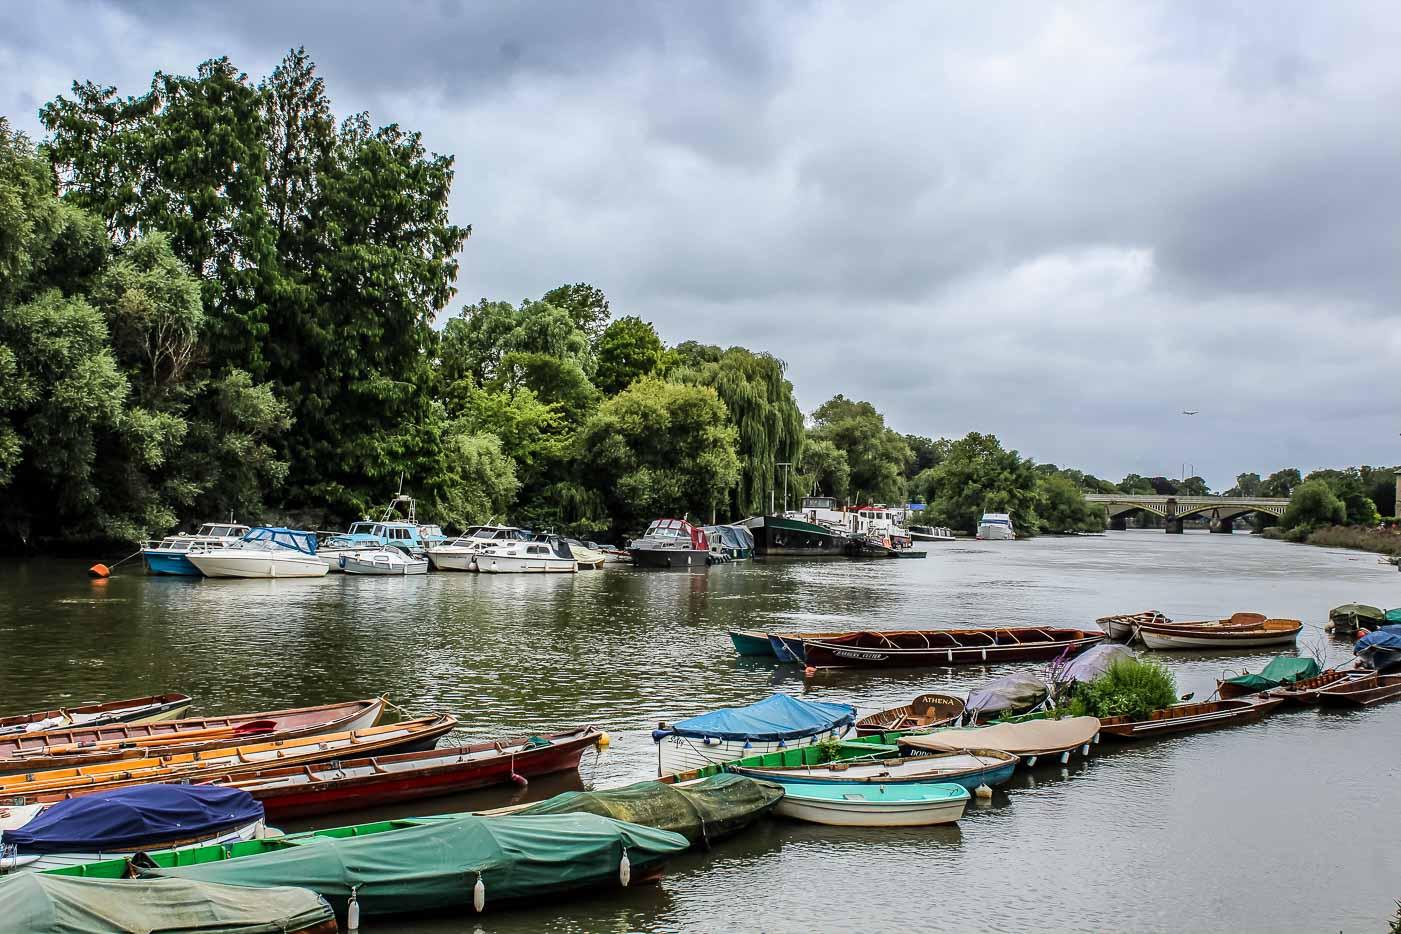 Guide to the beautiful Richmond neighbourhood of London